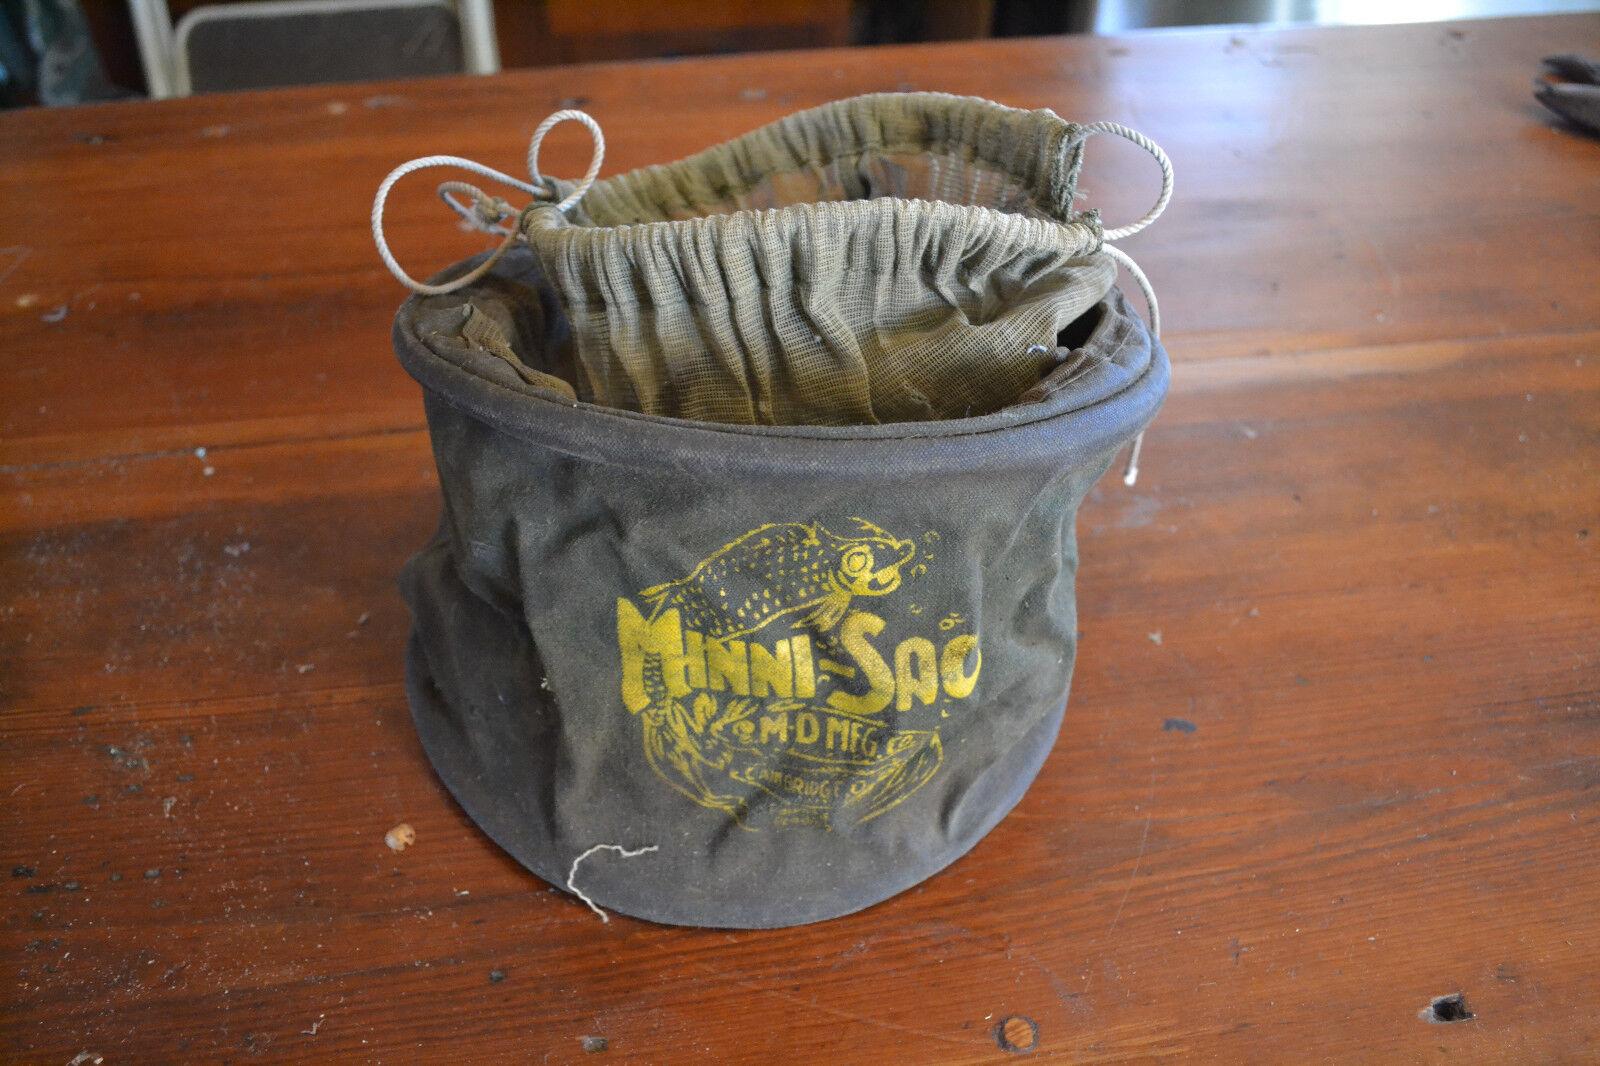 Vintage Fishermans Minni-Sac By M-D MFG Co Cambridge, O.O. Fishing Bag, Creel